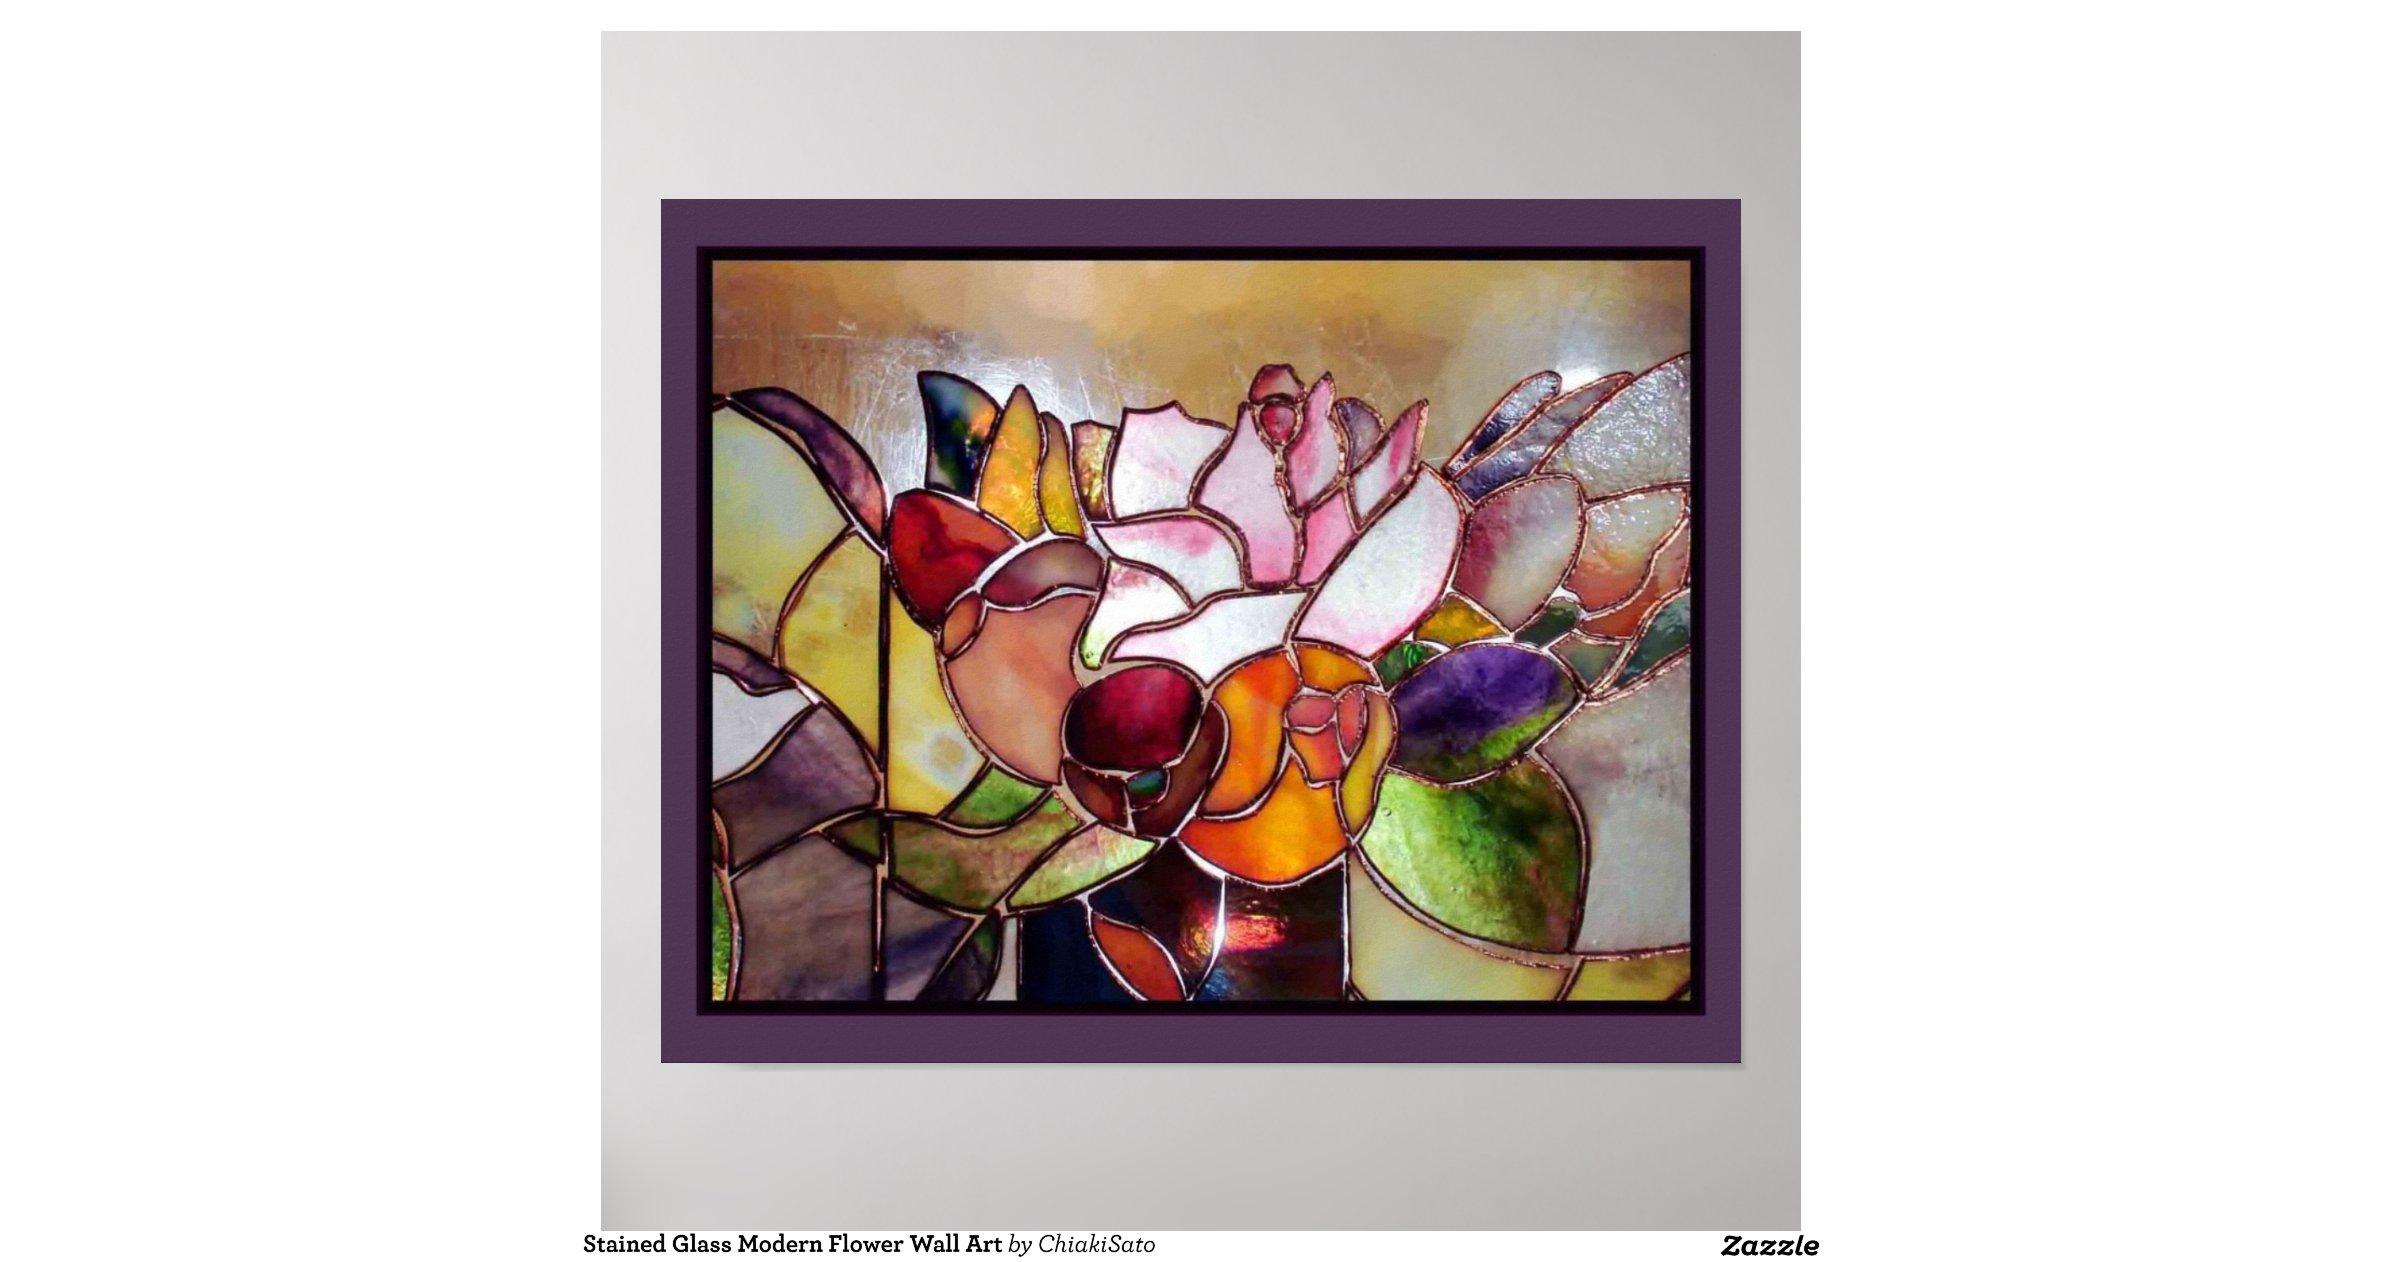 Modern Glass Wall Decor : Stained glass modern flower wall art poster zazzle